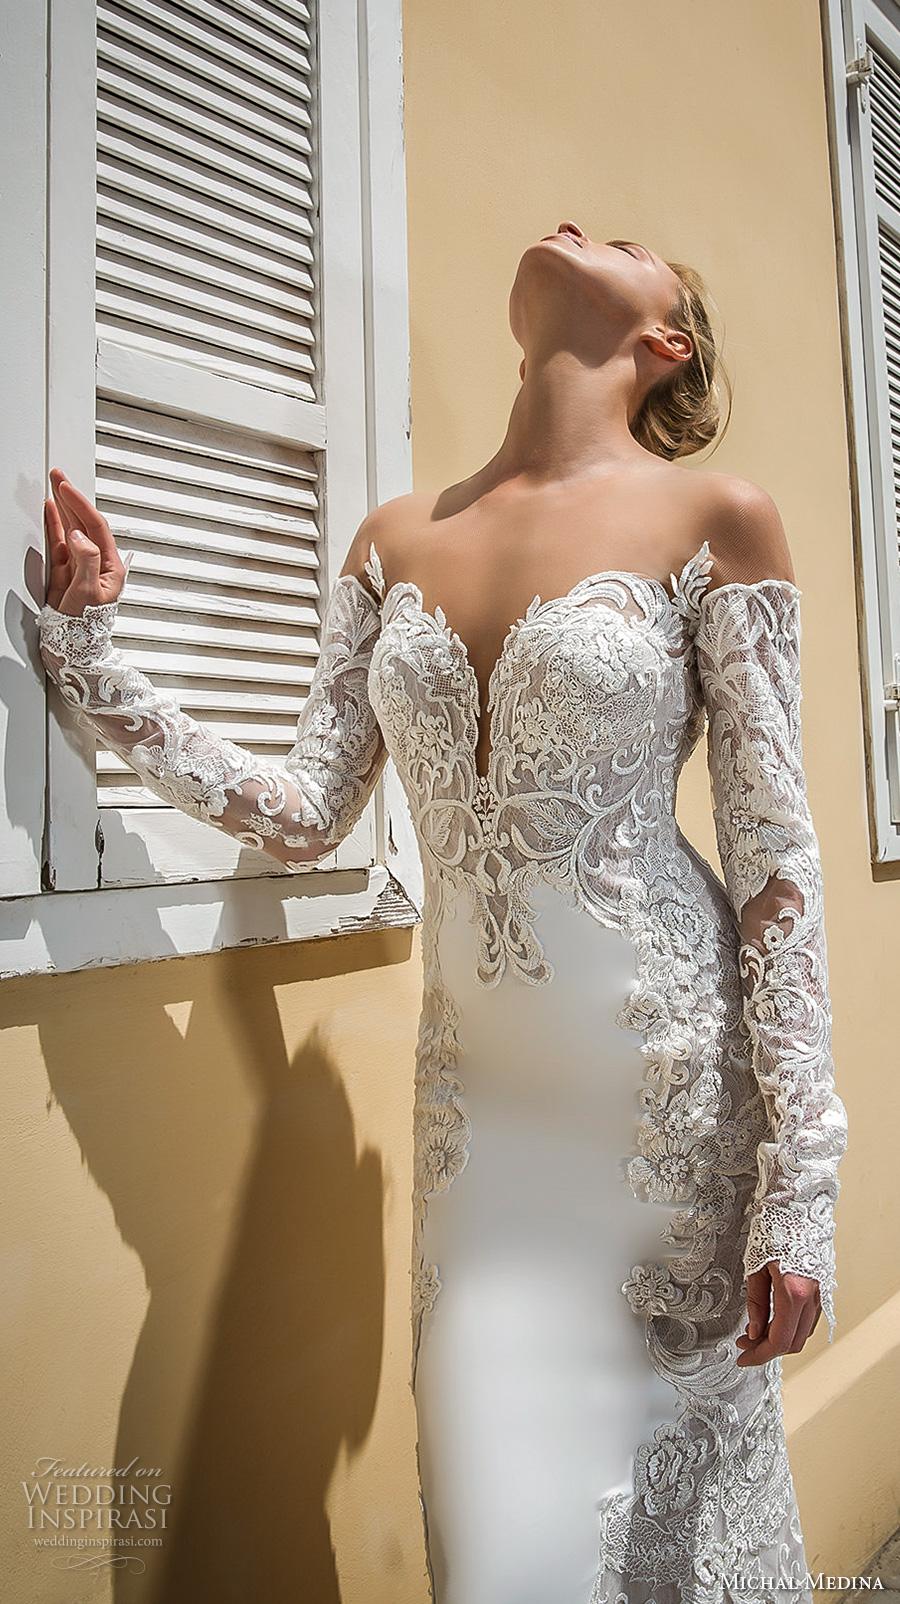 michal medina 2017 bridal off the shoulder long sleeves deep plunging sweetheart neckline heavily embellished bodice elegant sheath wedding dress open low back chapel train (audrey) zv